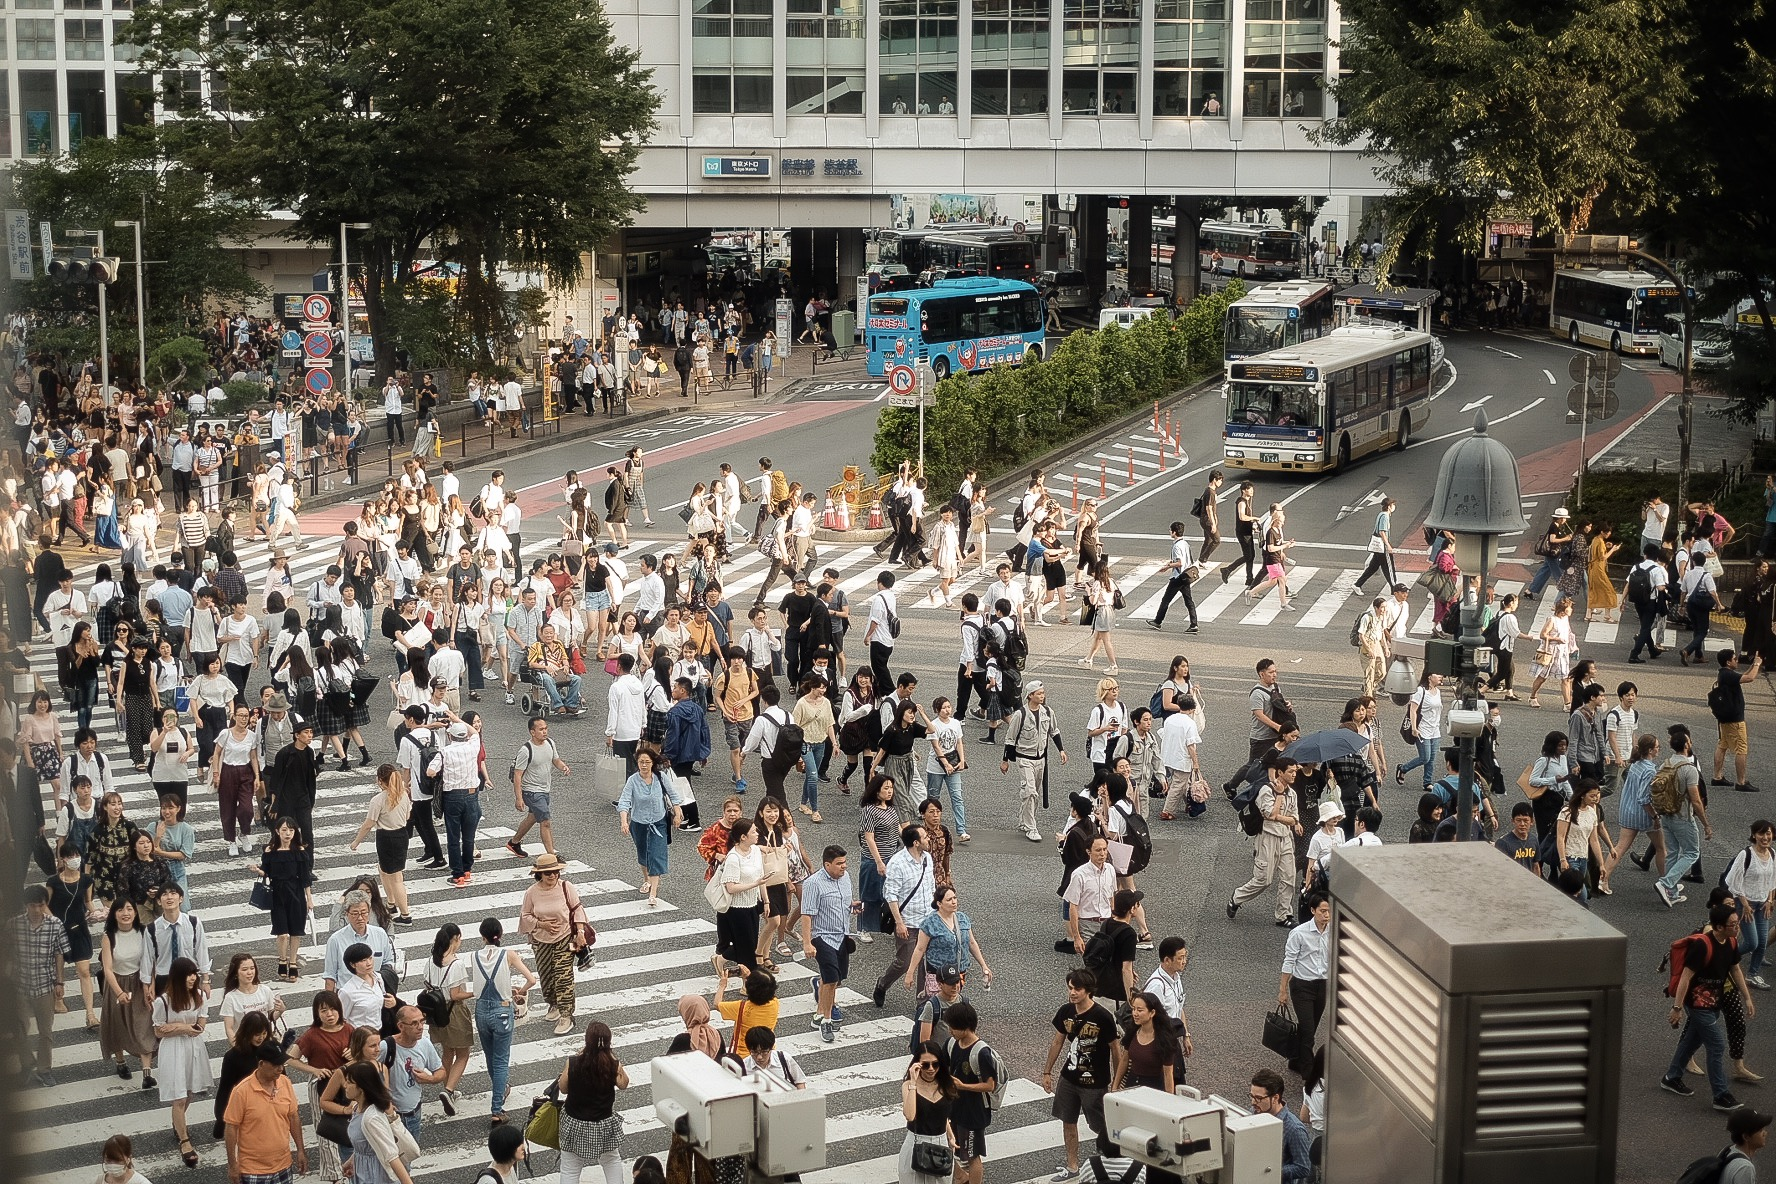 shibuya crossroad 涉谷十字路口